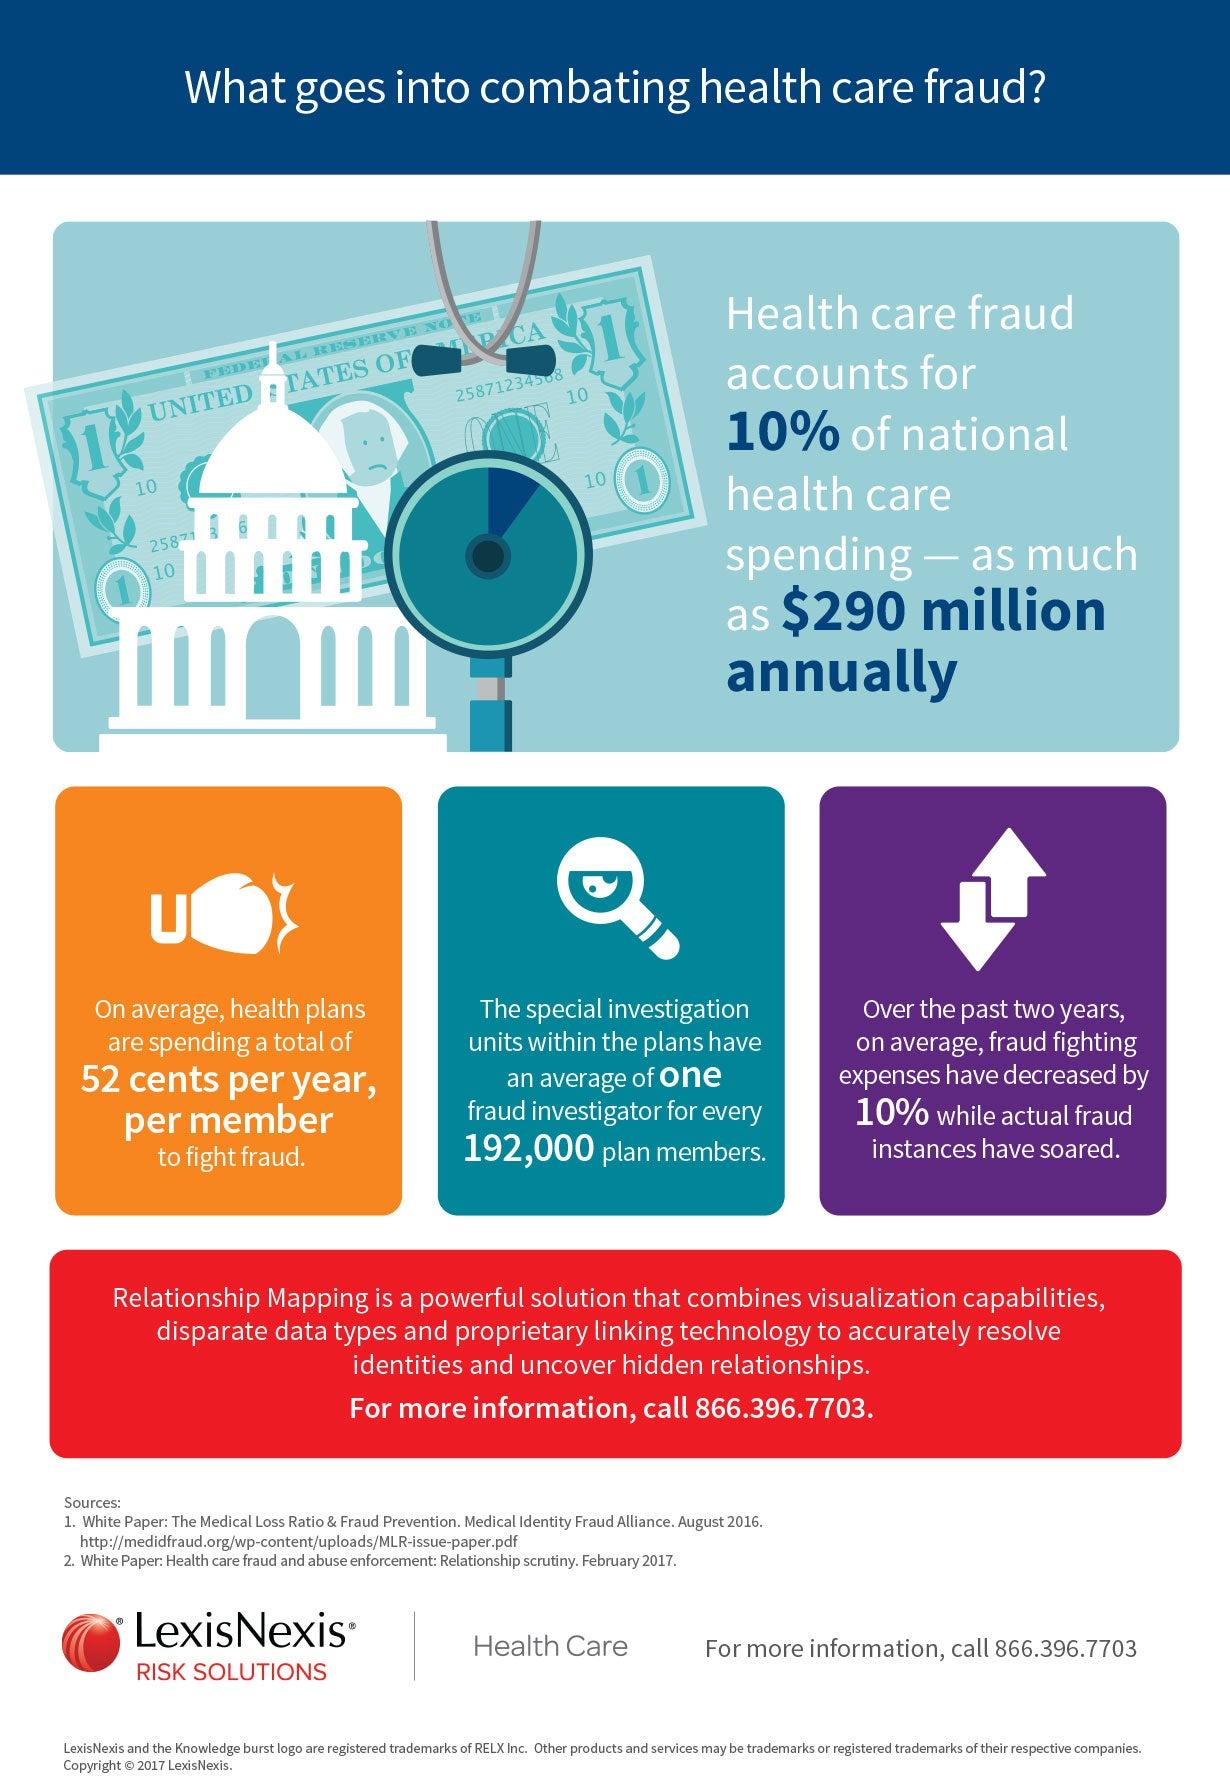 hc-Combat-Fraud-infographic